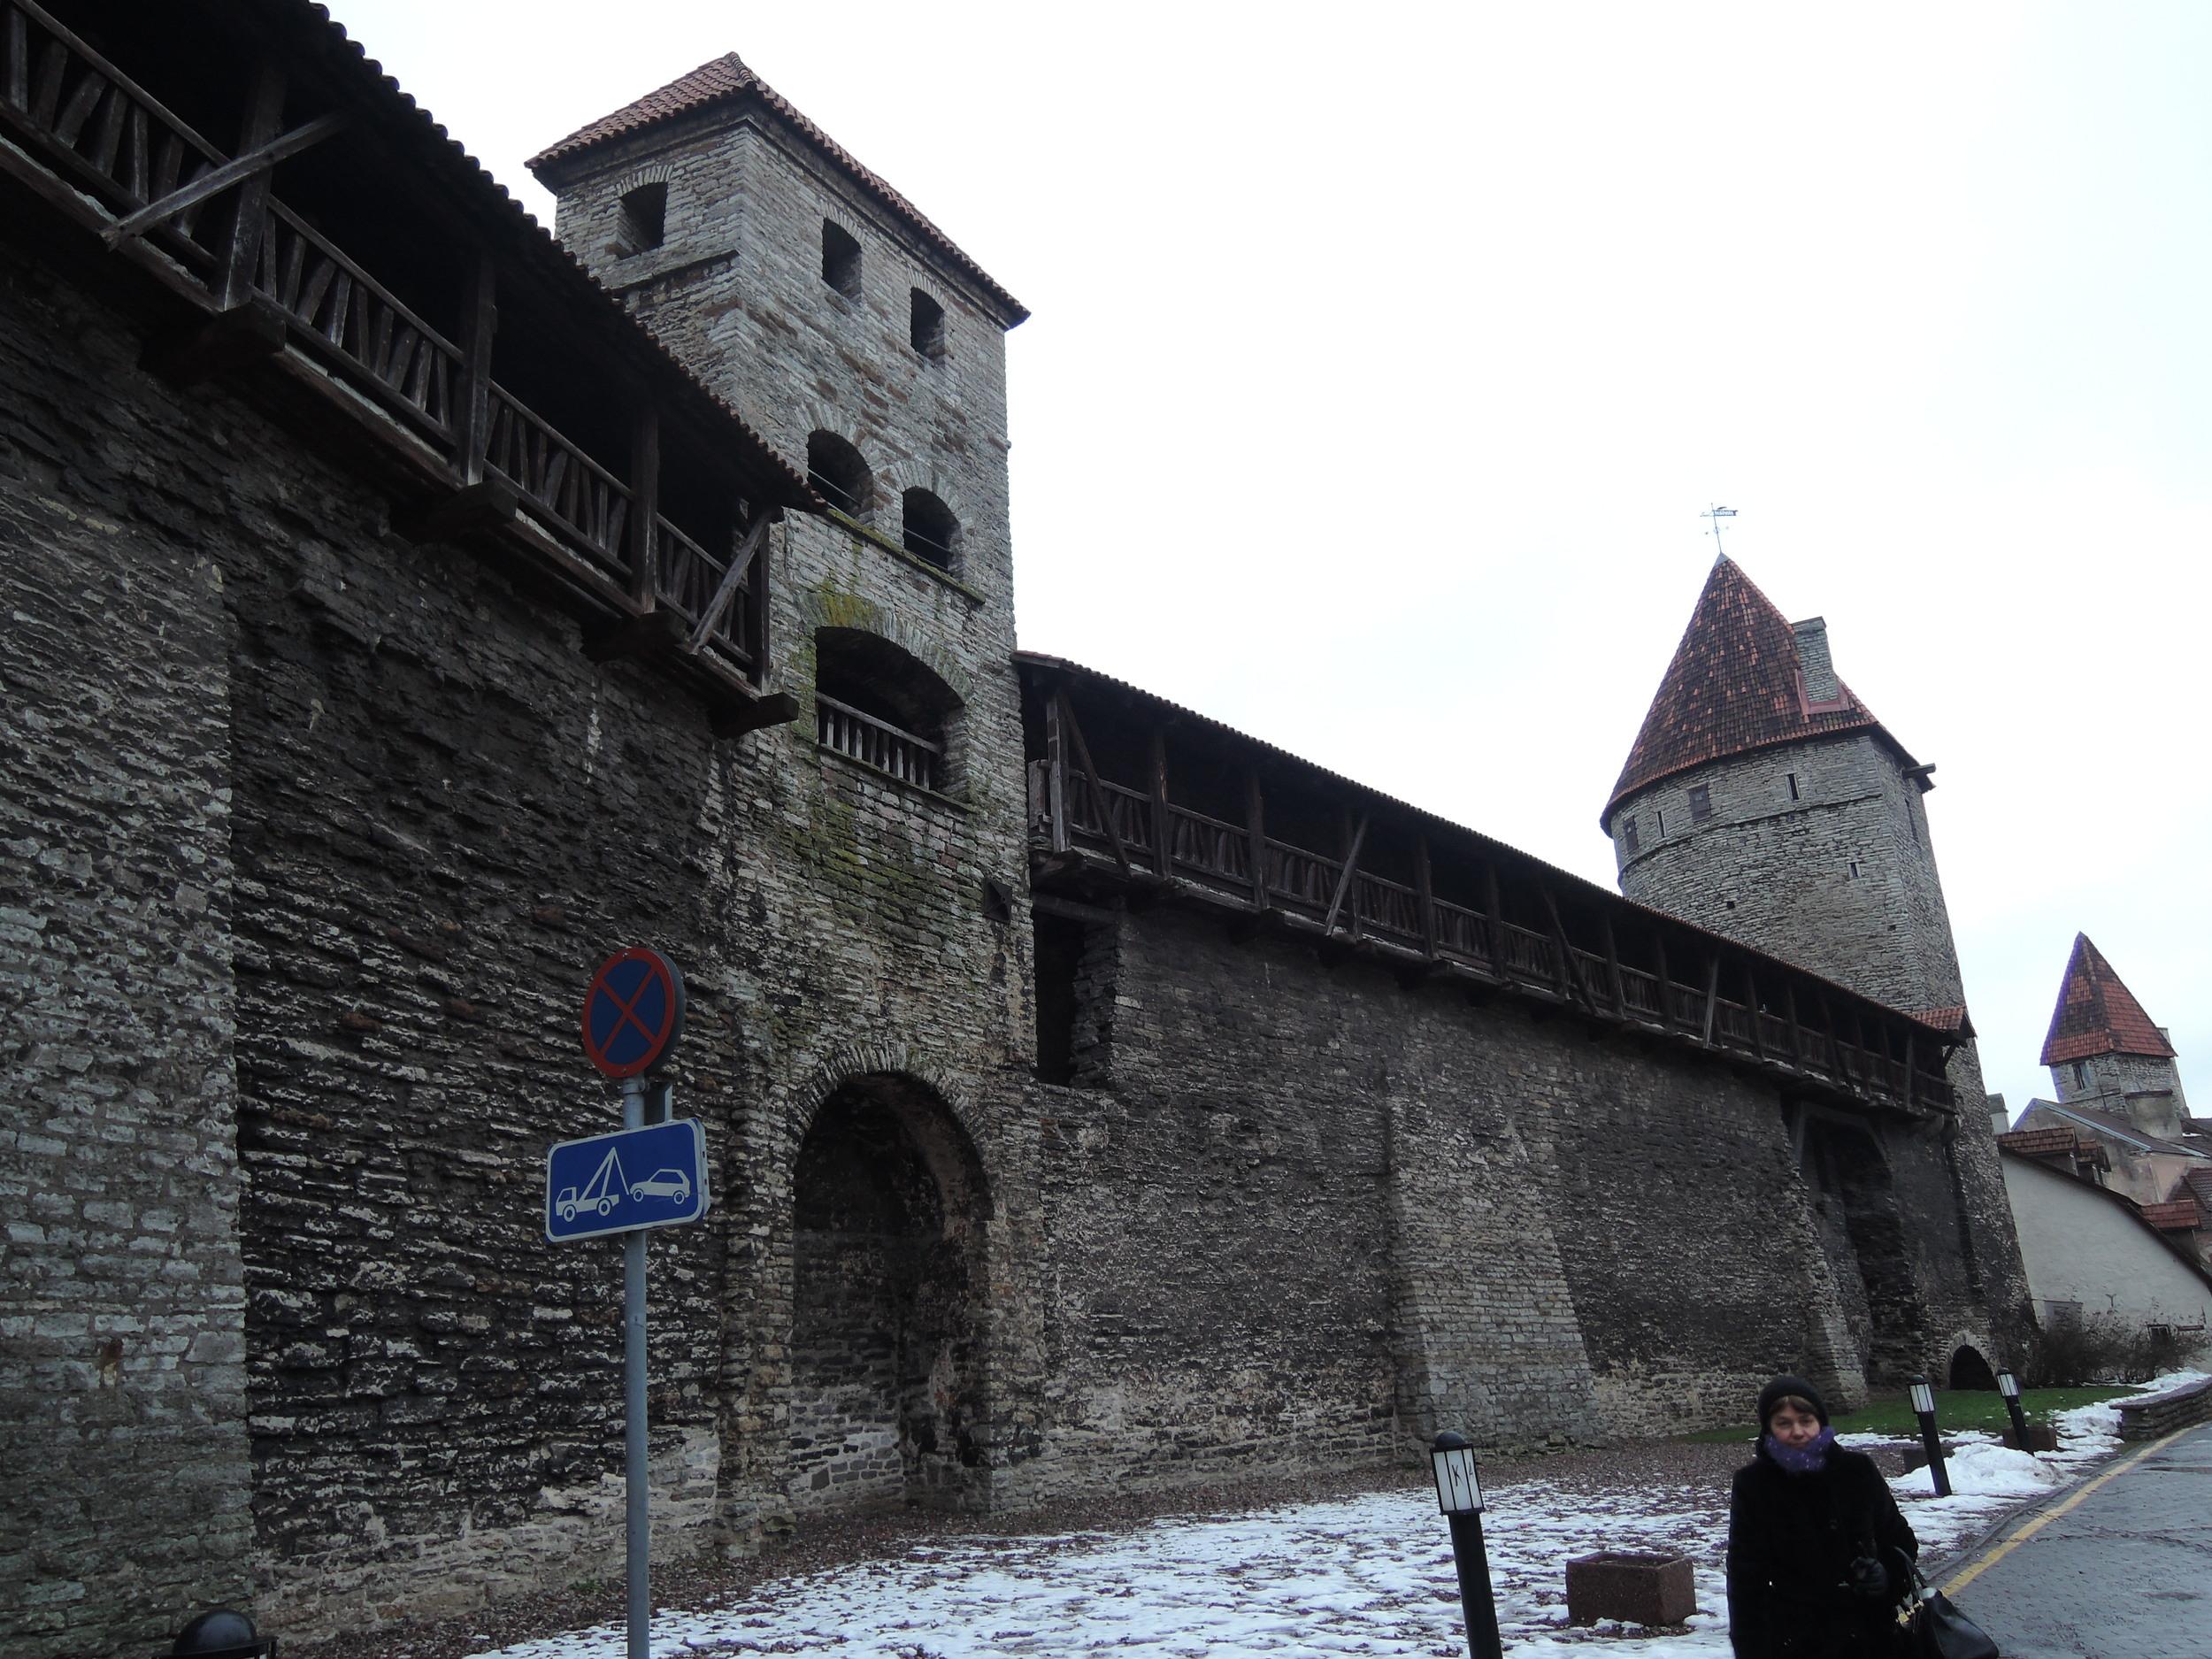 The wall of old Tallinn